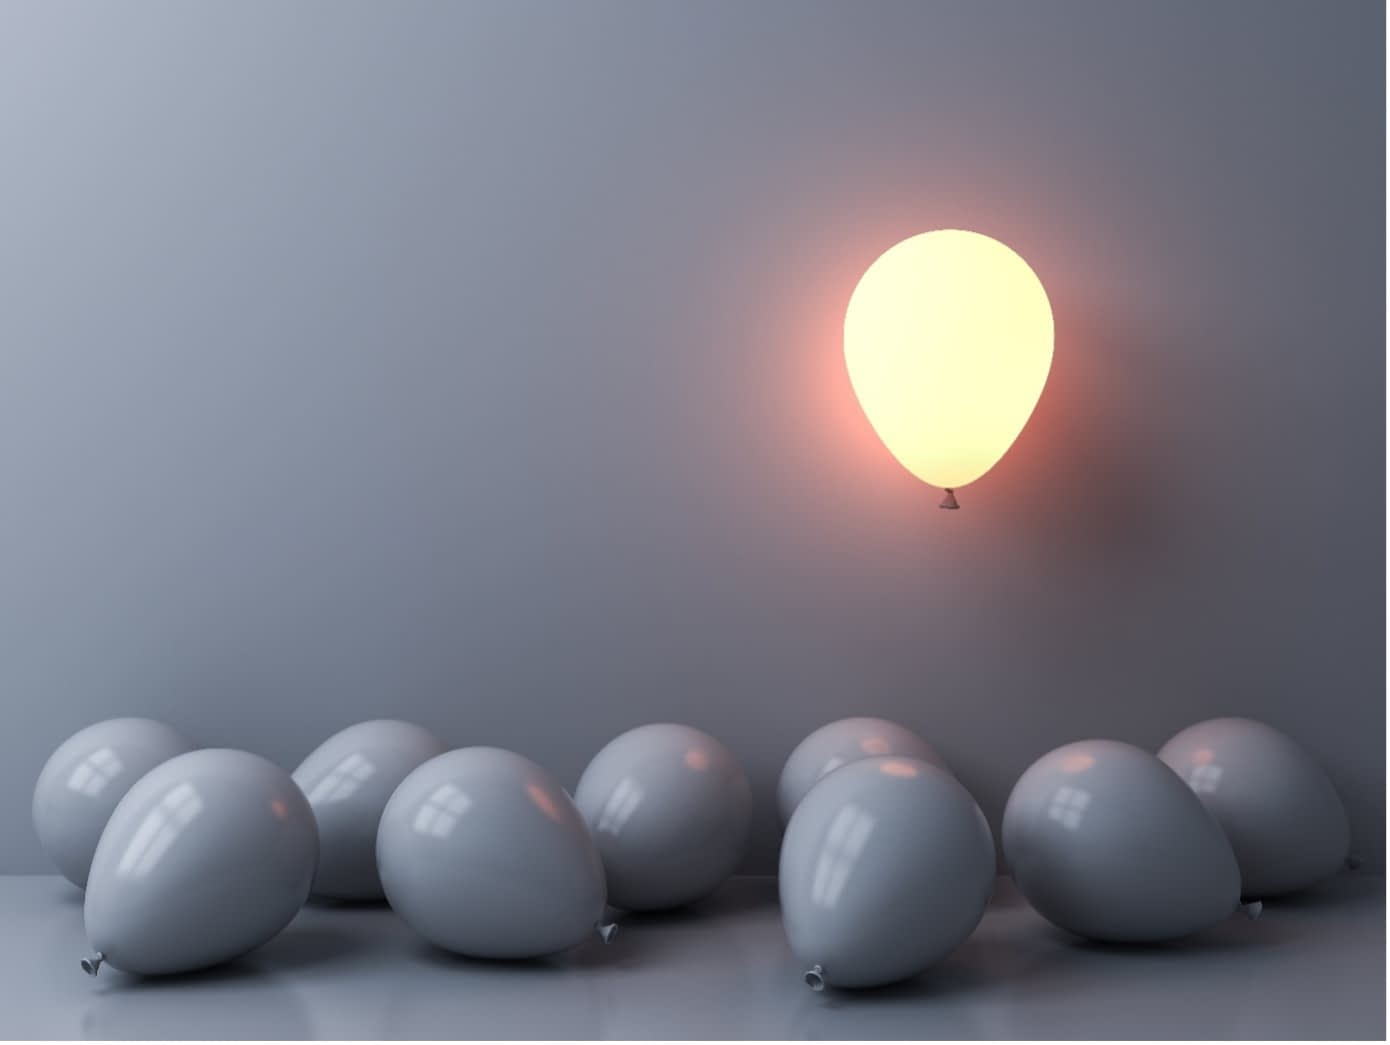 nextera-careers idea image